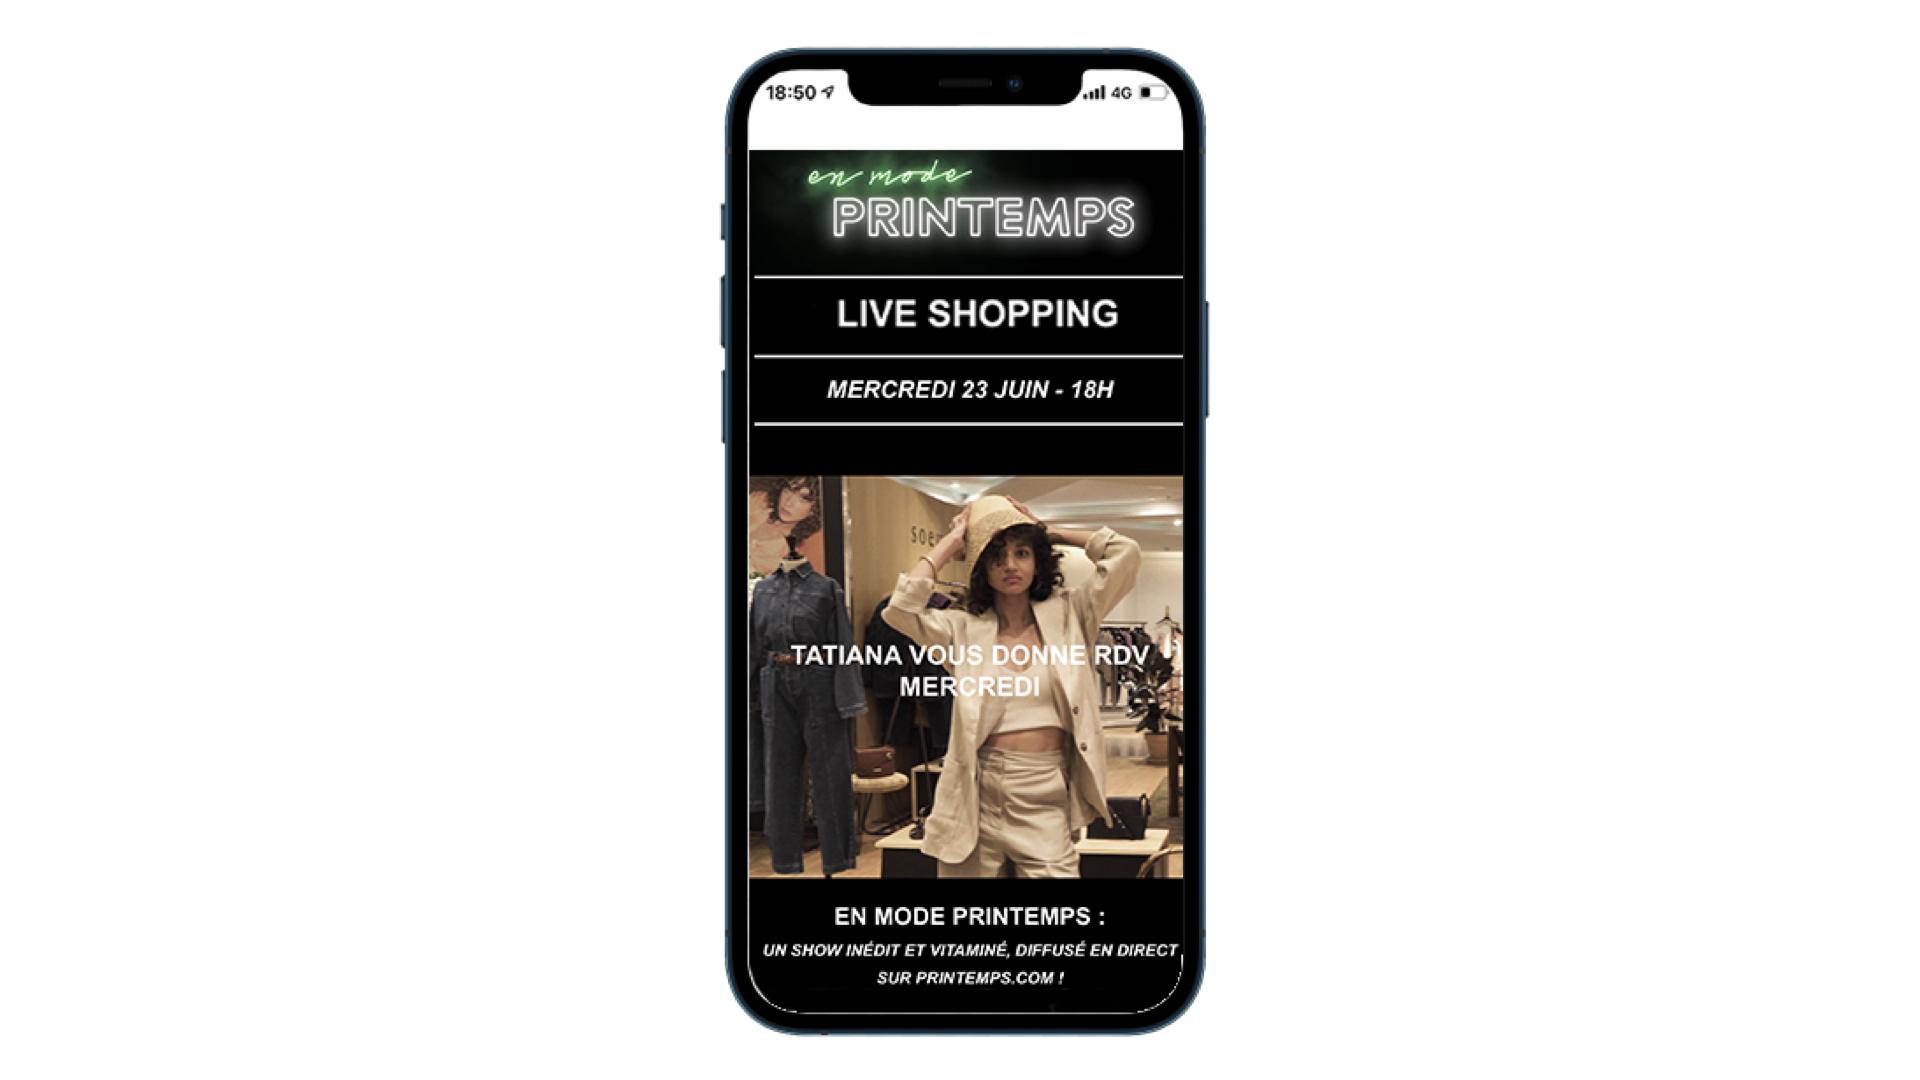 Printemps is debuting live shopping.